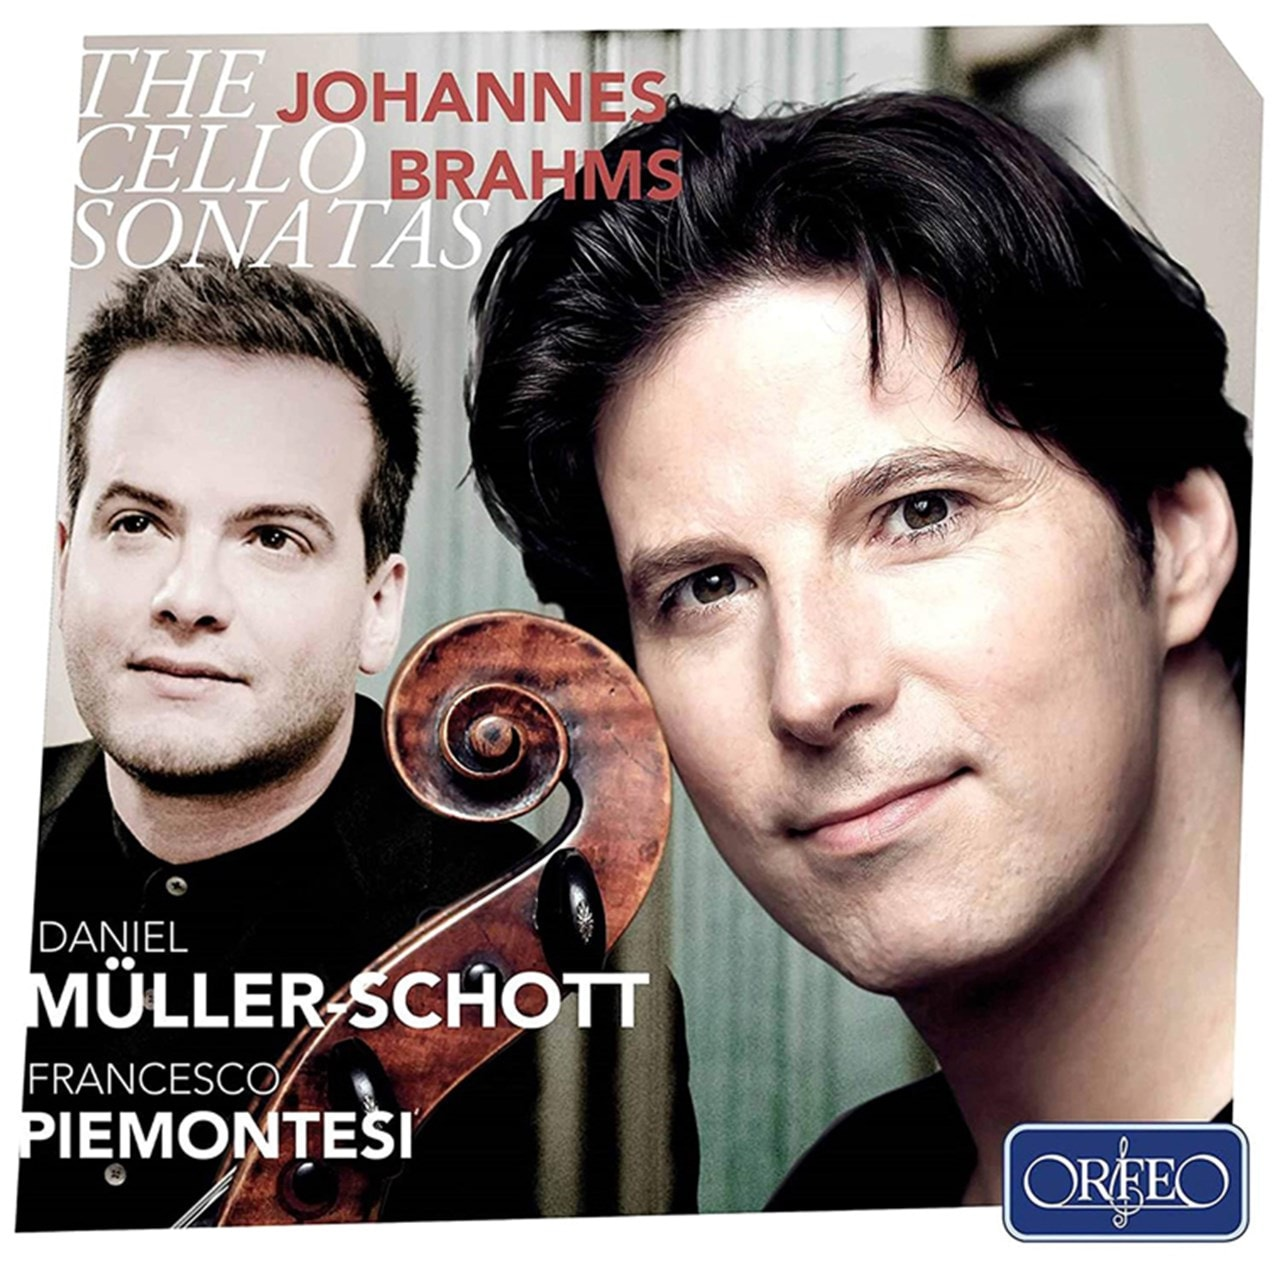 Johannes Brahms: The Cello Sonata - 1